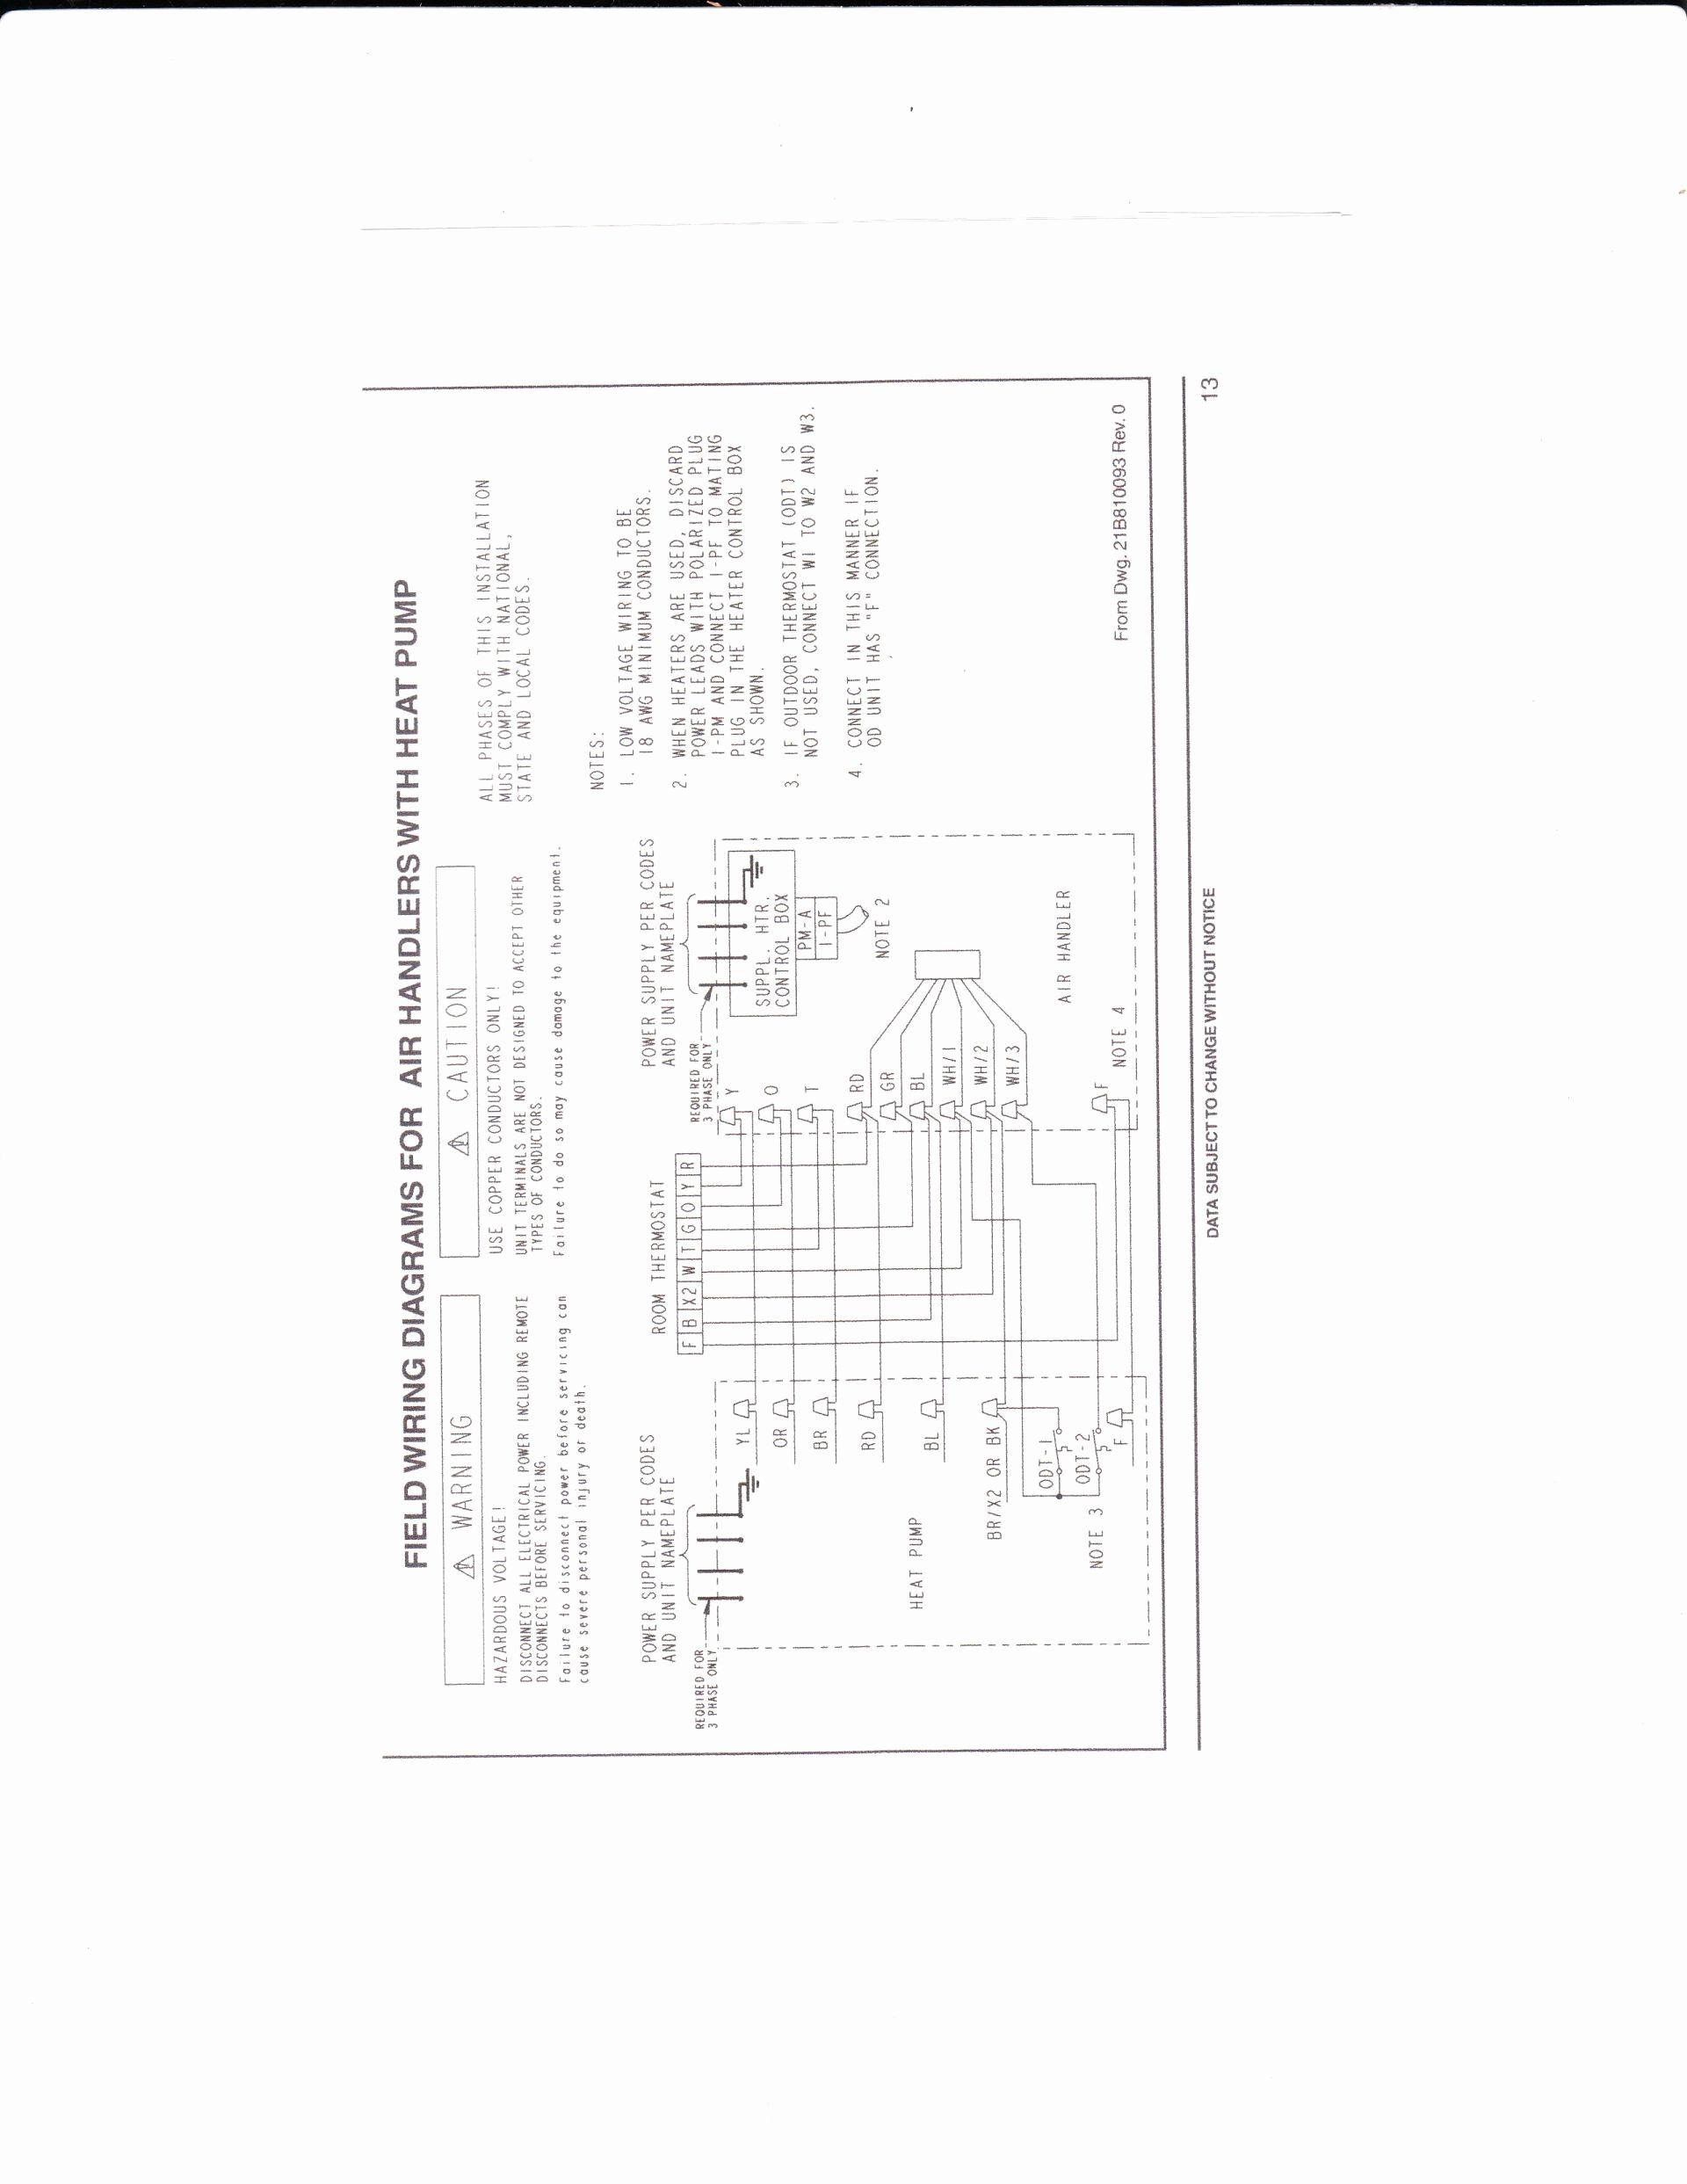 Electric Baseboard Heater Wiring Diagram Lovely Baseboard Heater - Baseboard Heater Thermostat Wiring Diagram